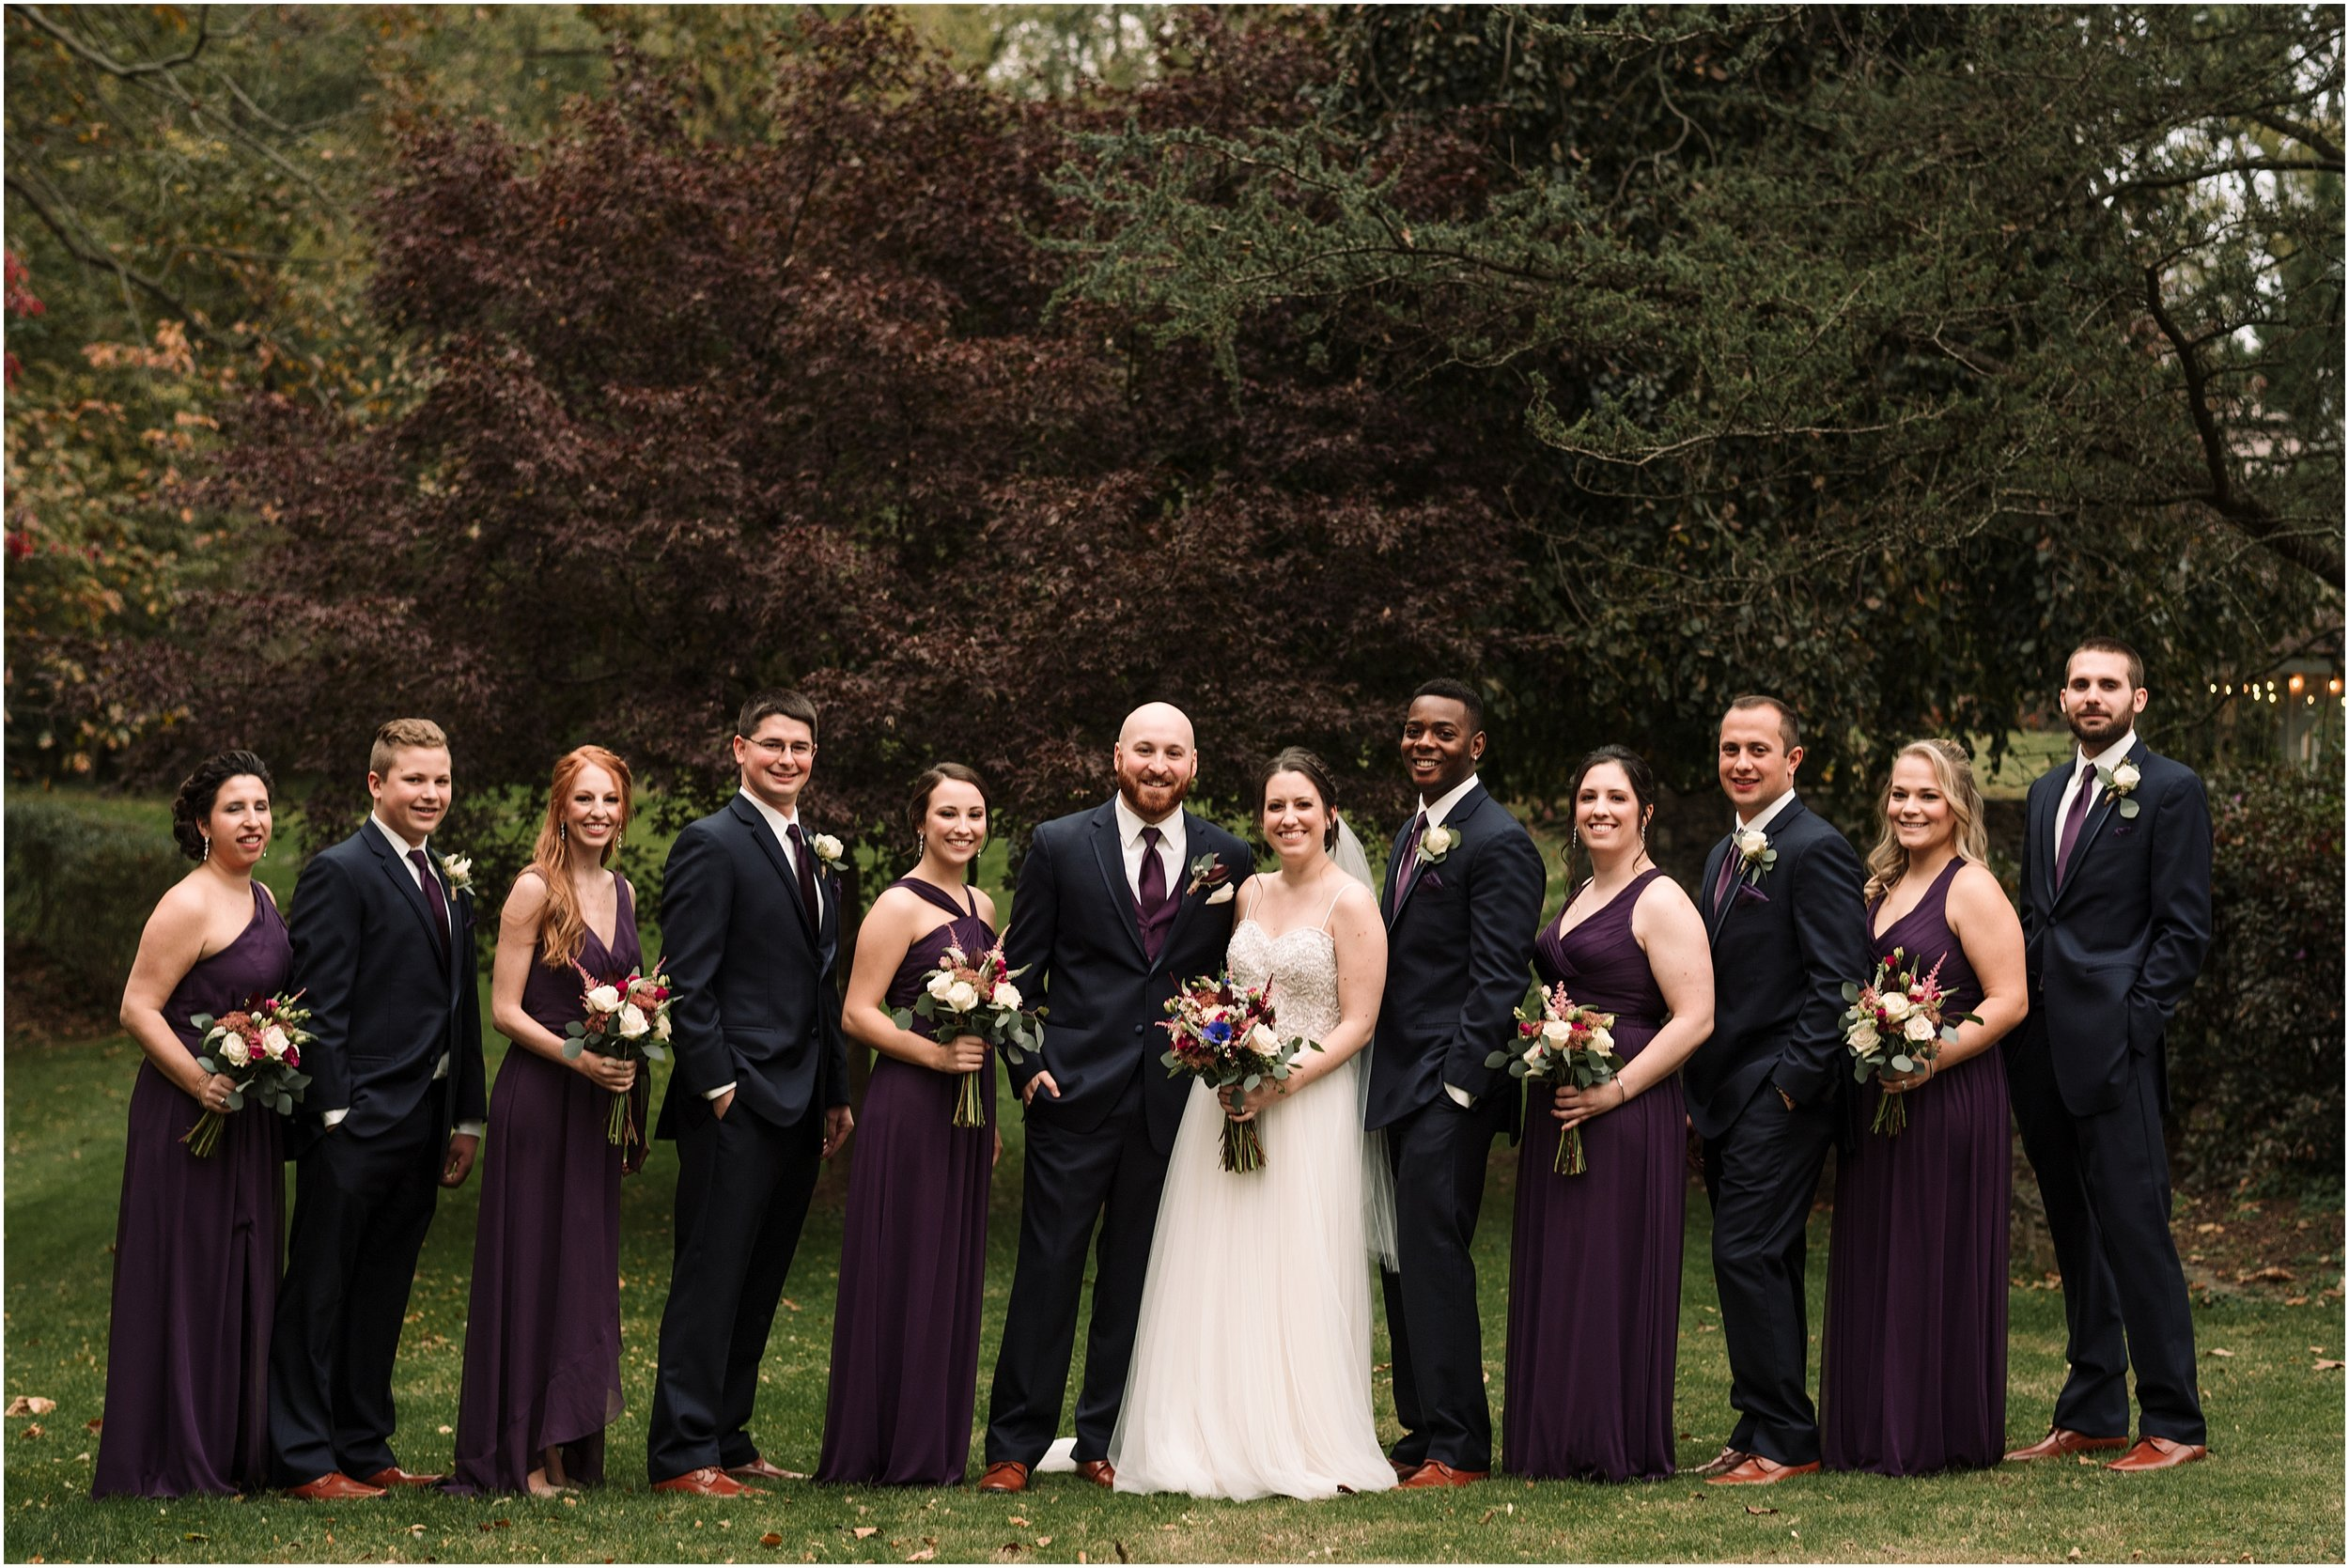 hannah leigh photography riverdale manor wedding lancaster pa_2031.jpg